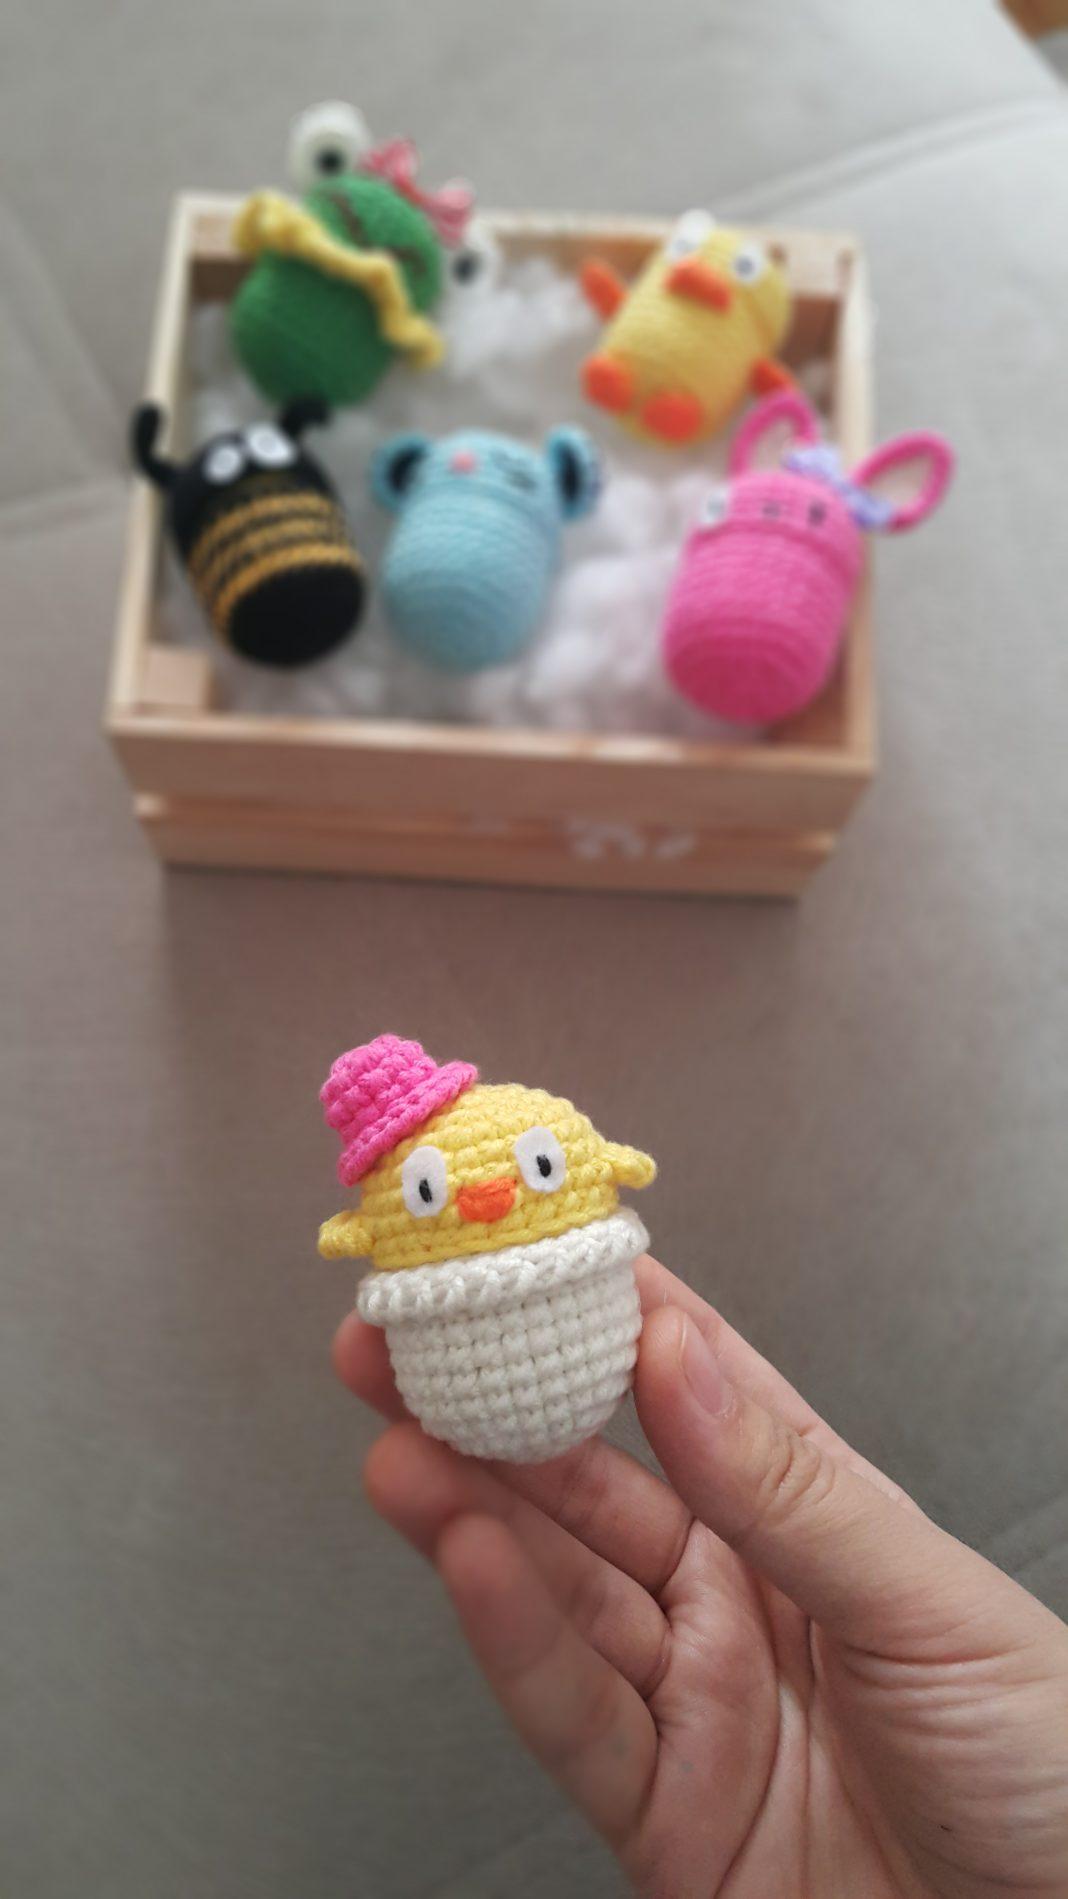 civciv-figurlu-surpriz-yumurta-kutusu-susleme-yapimi